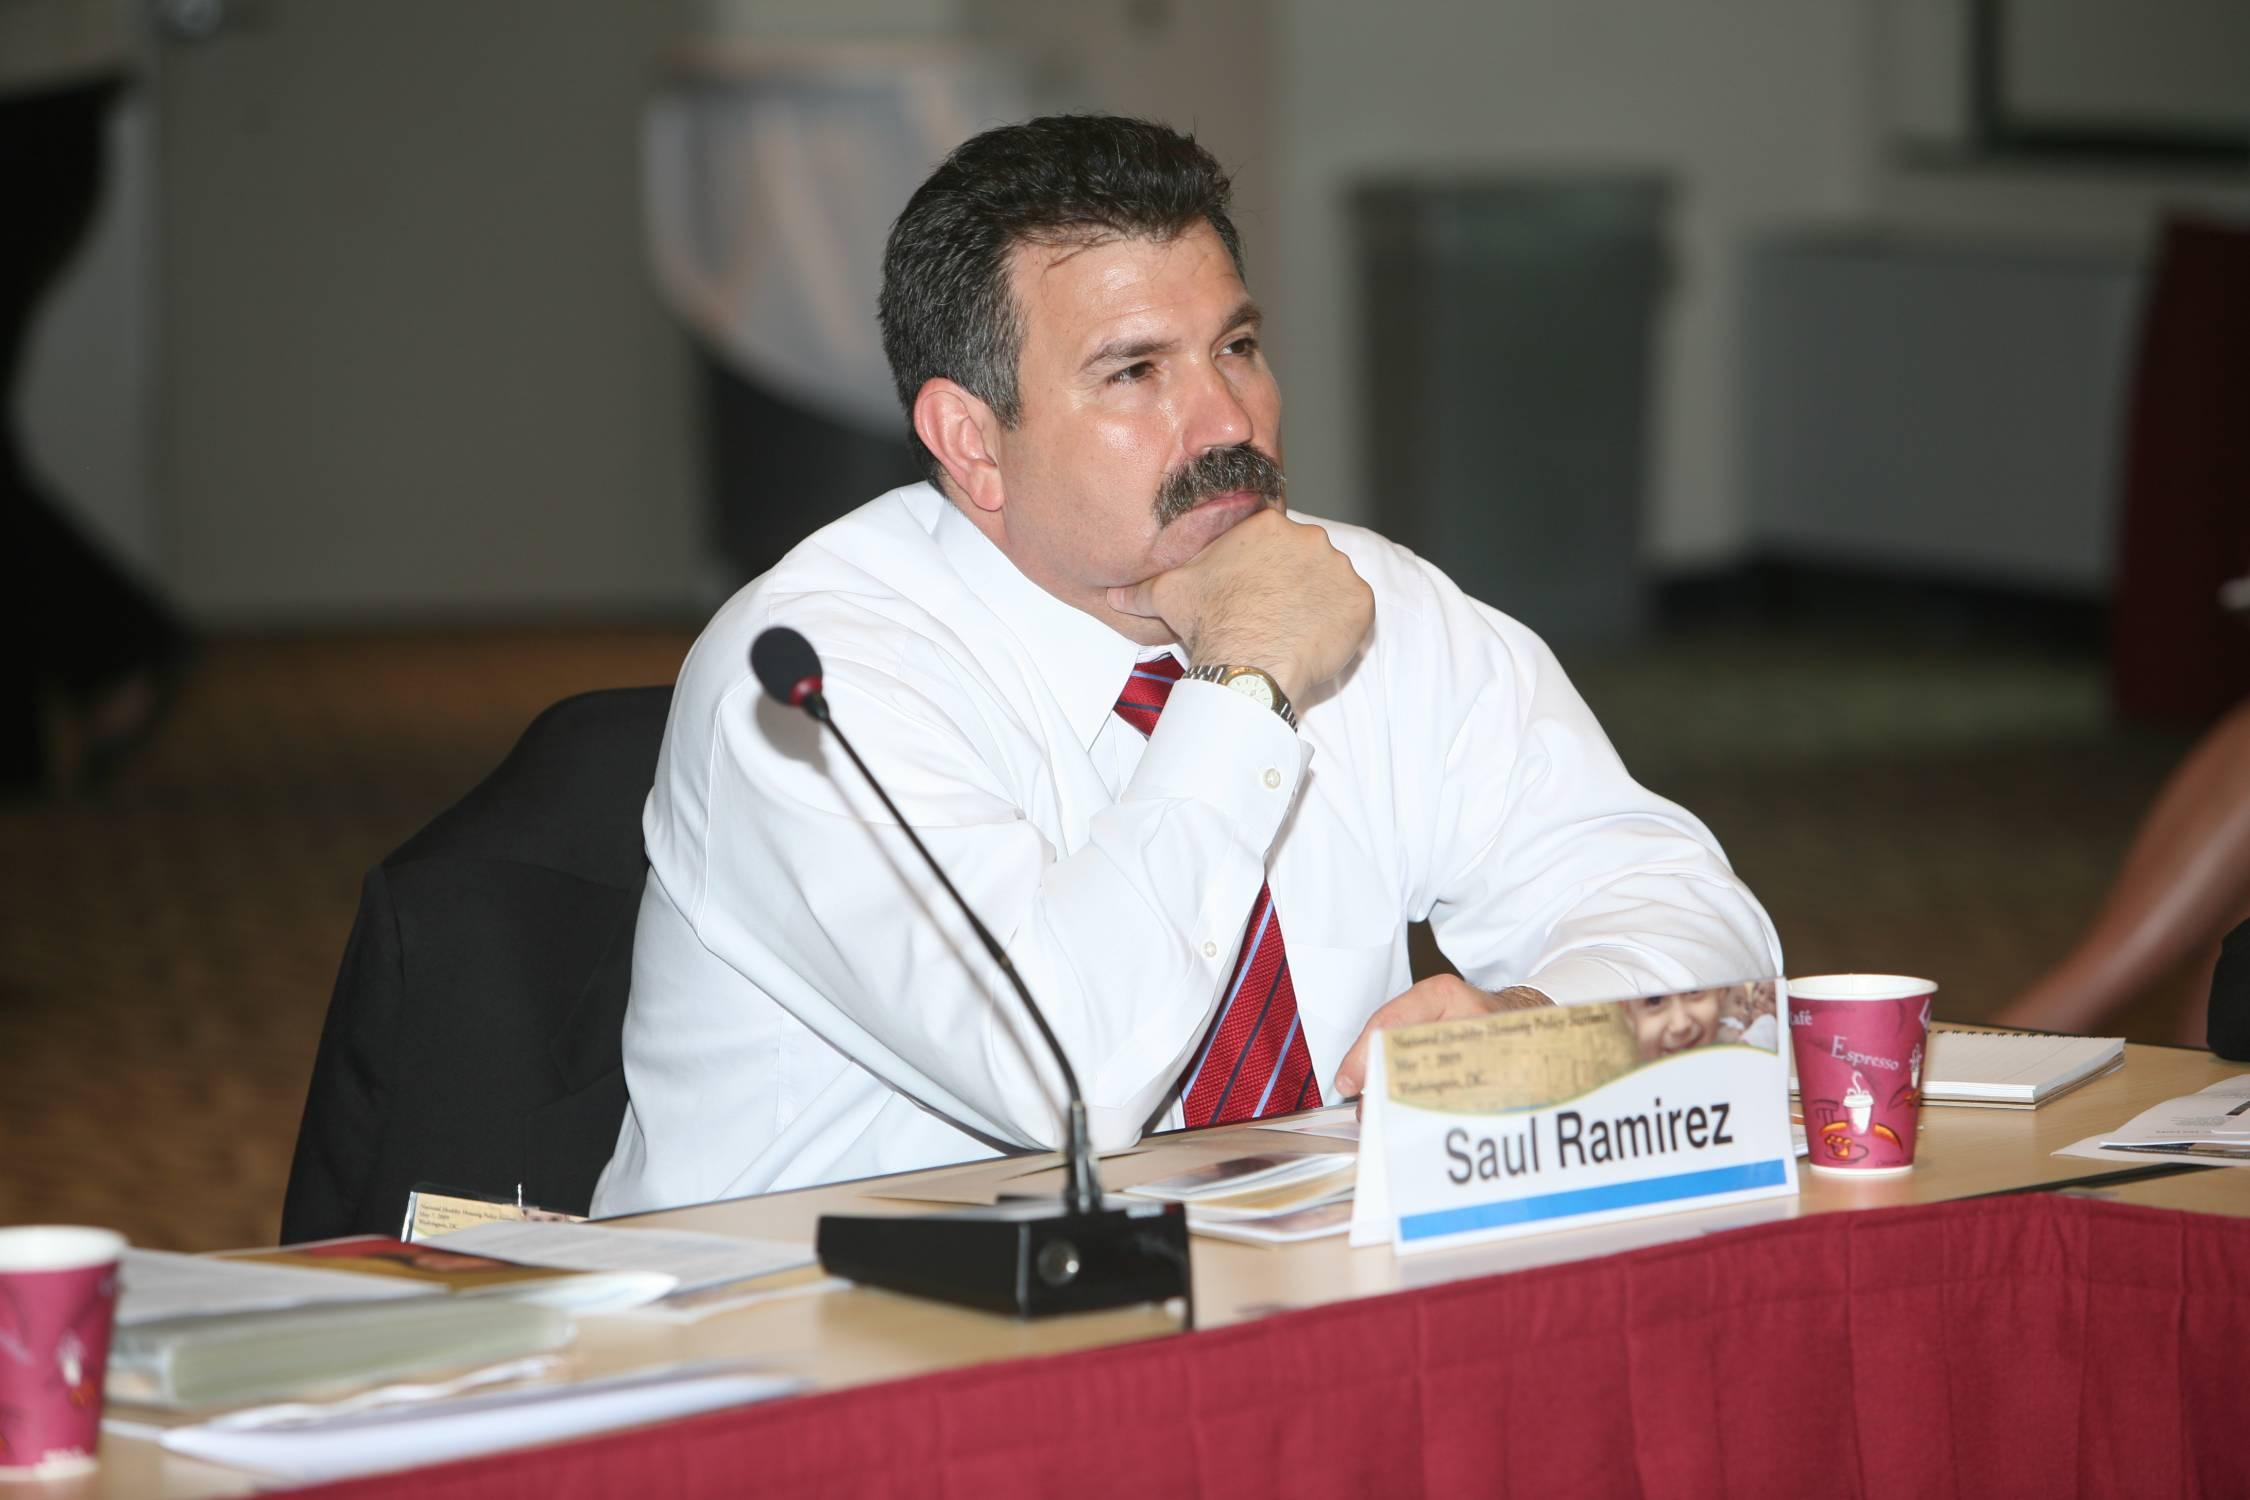 Saúl Ramirez, NCHH Board